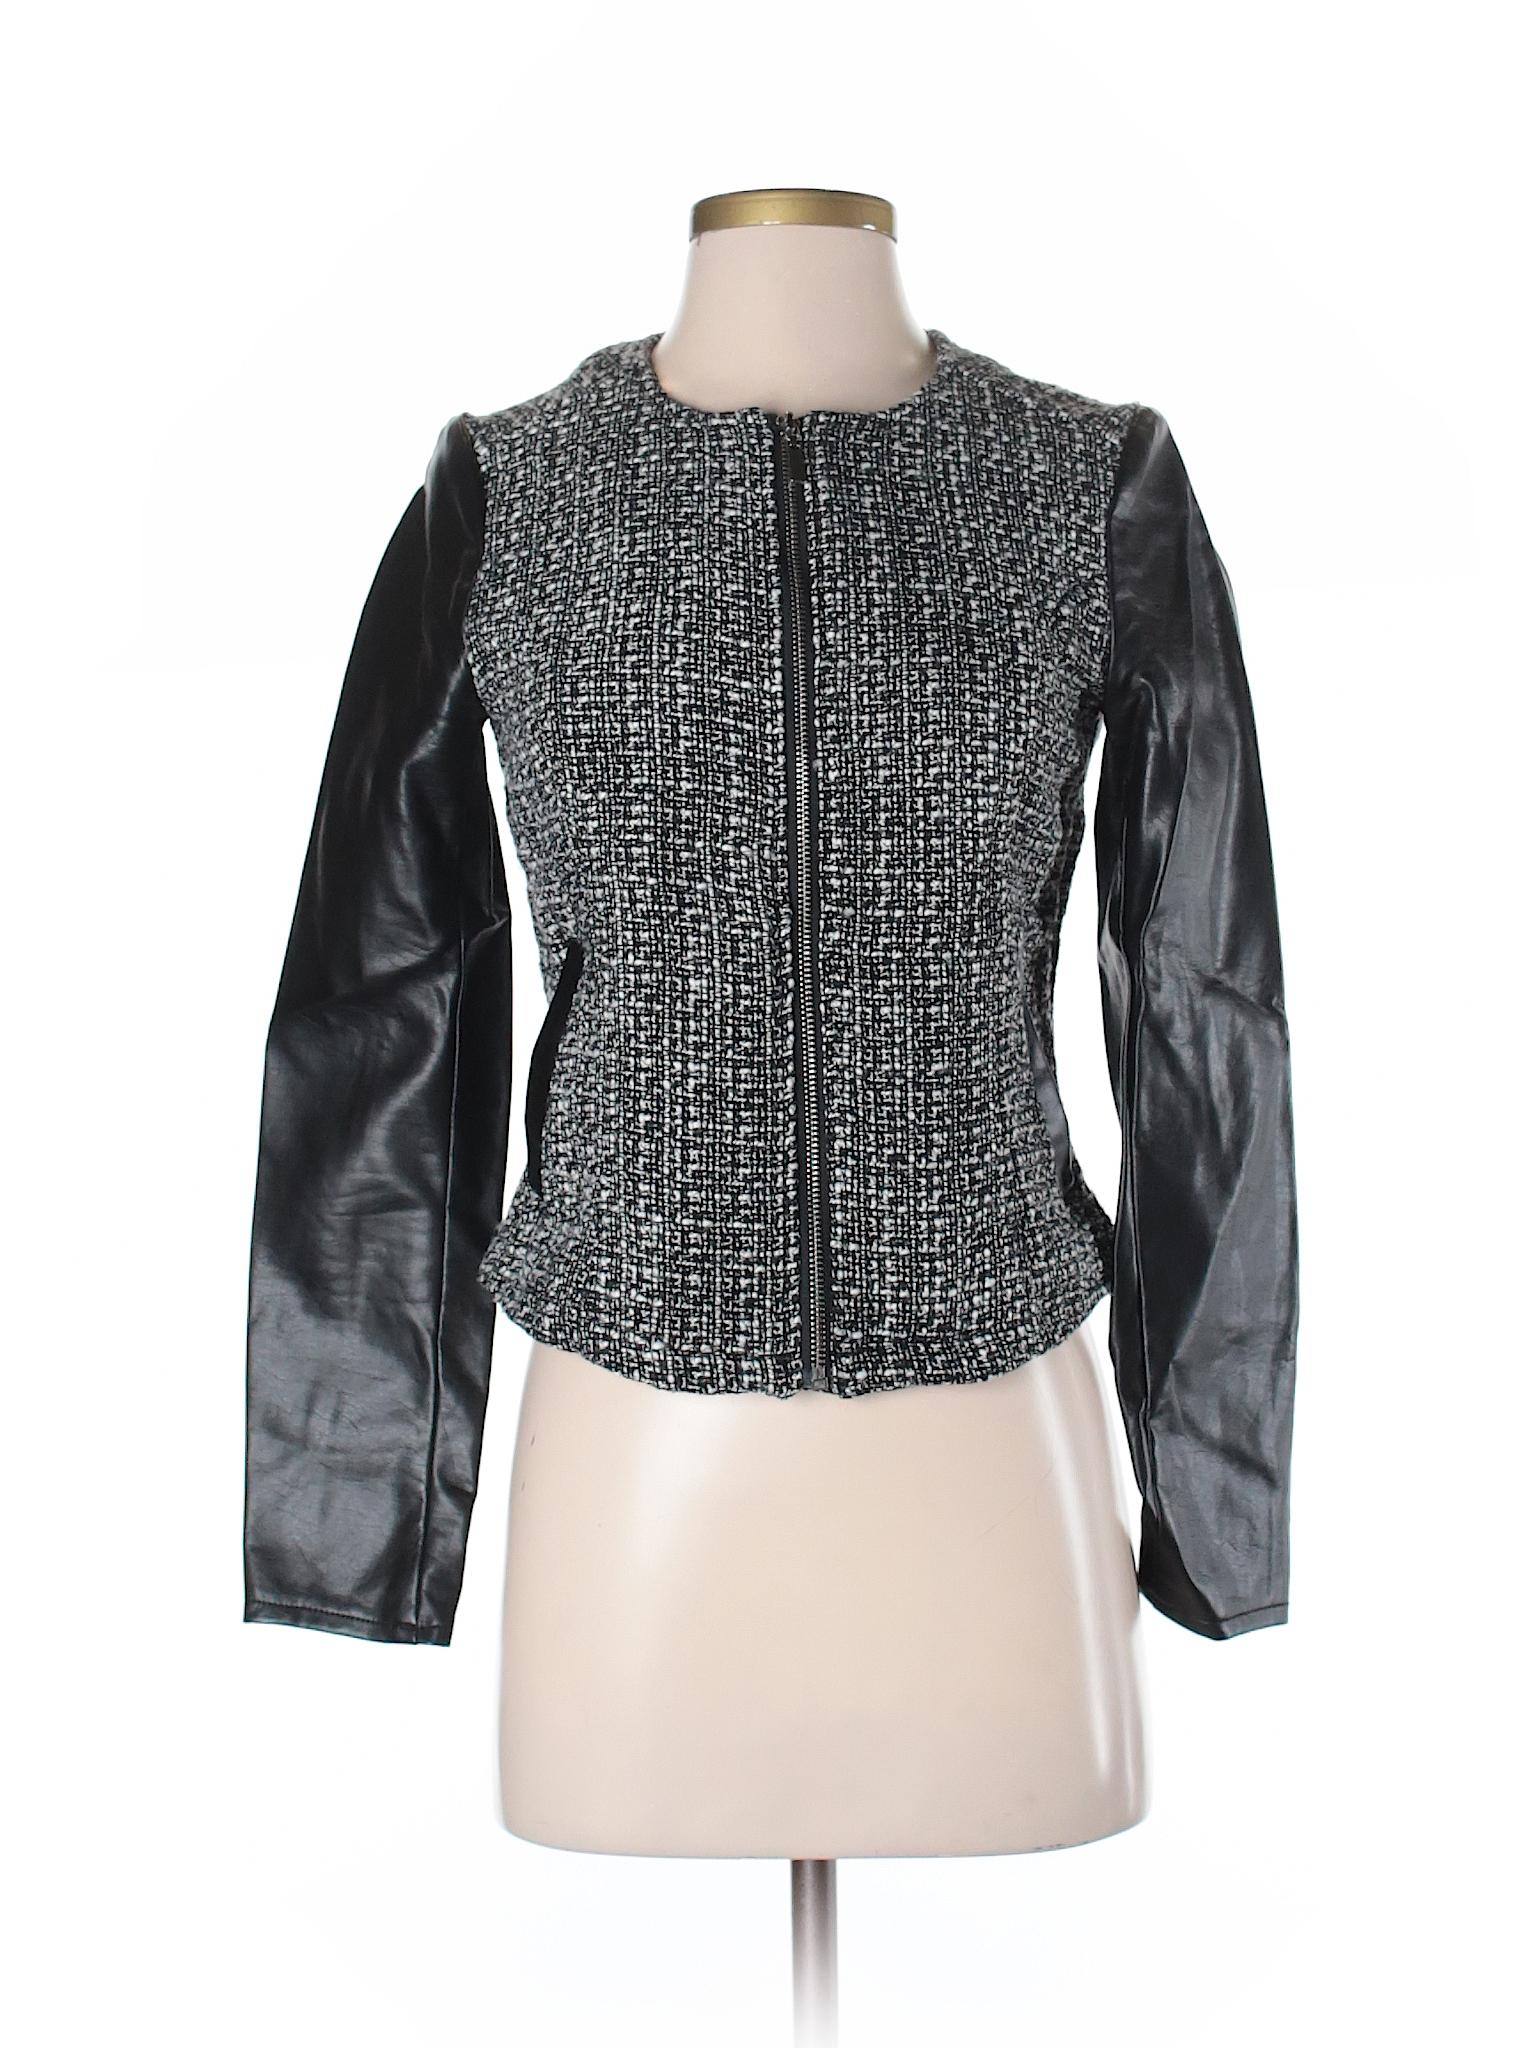 Divided Boutique leisure Jacket amp;M by H A7Z7wqBx1